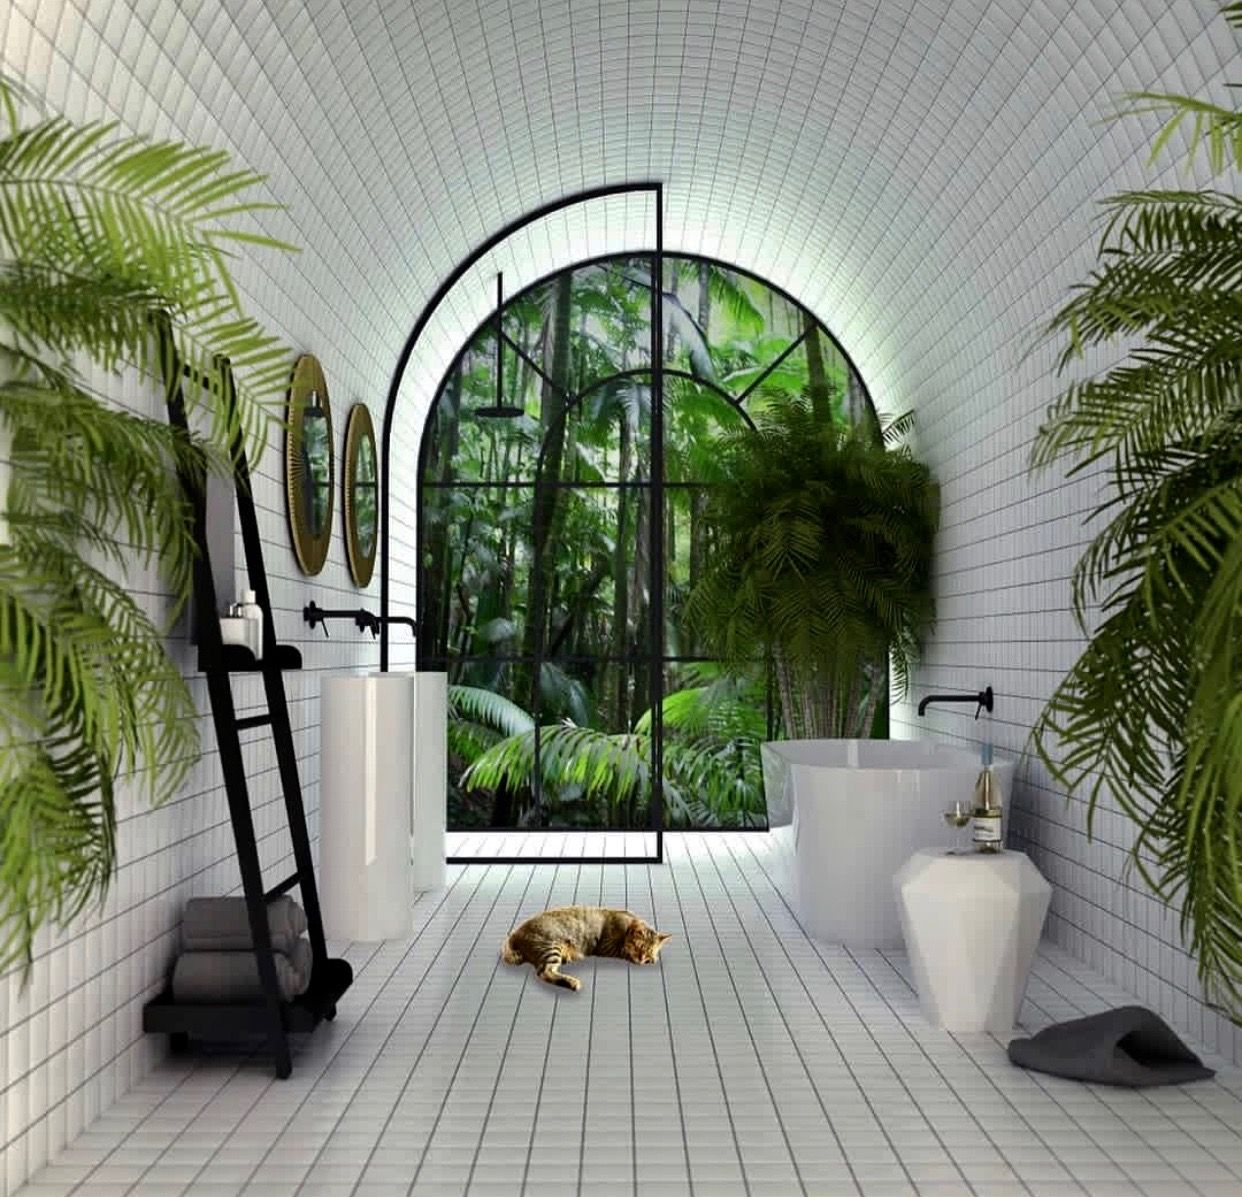 salle de bain cocooning plantes et blanches bathroom. Black Bedroom Furniture Sets. Home Design Ideas